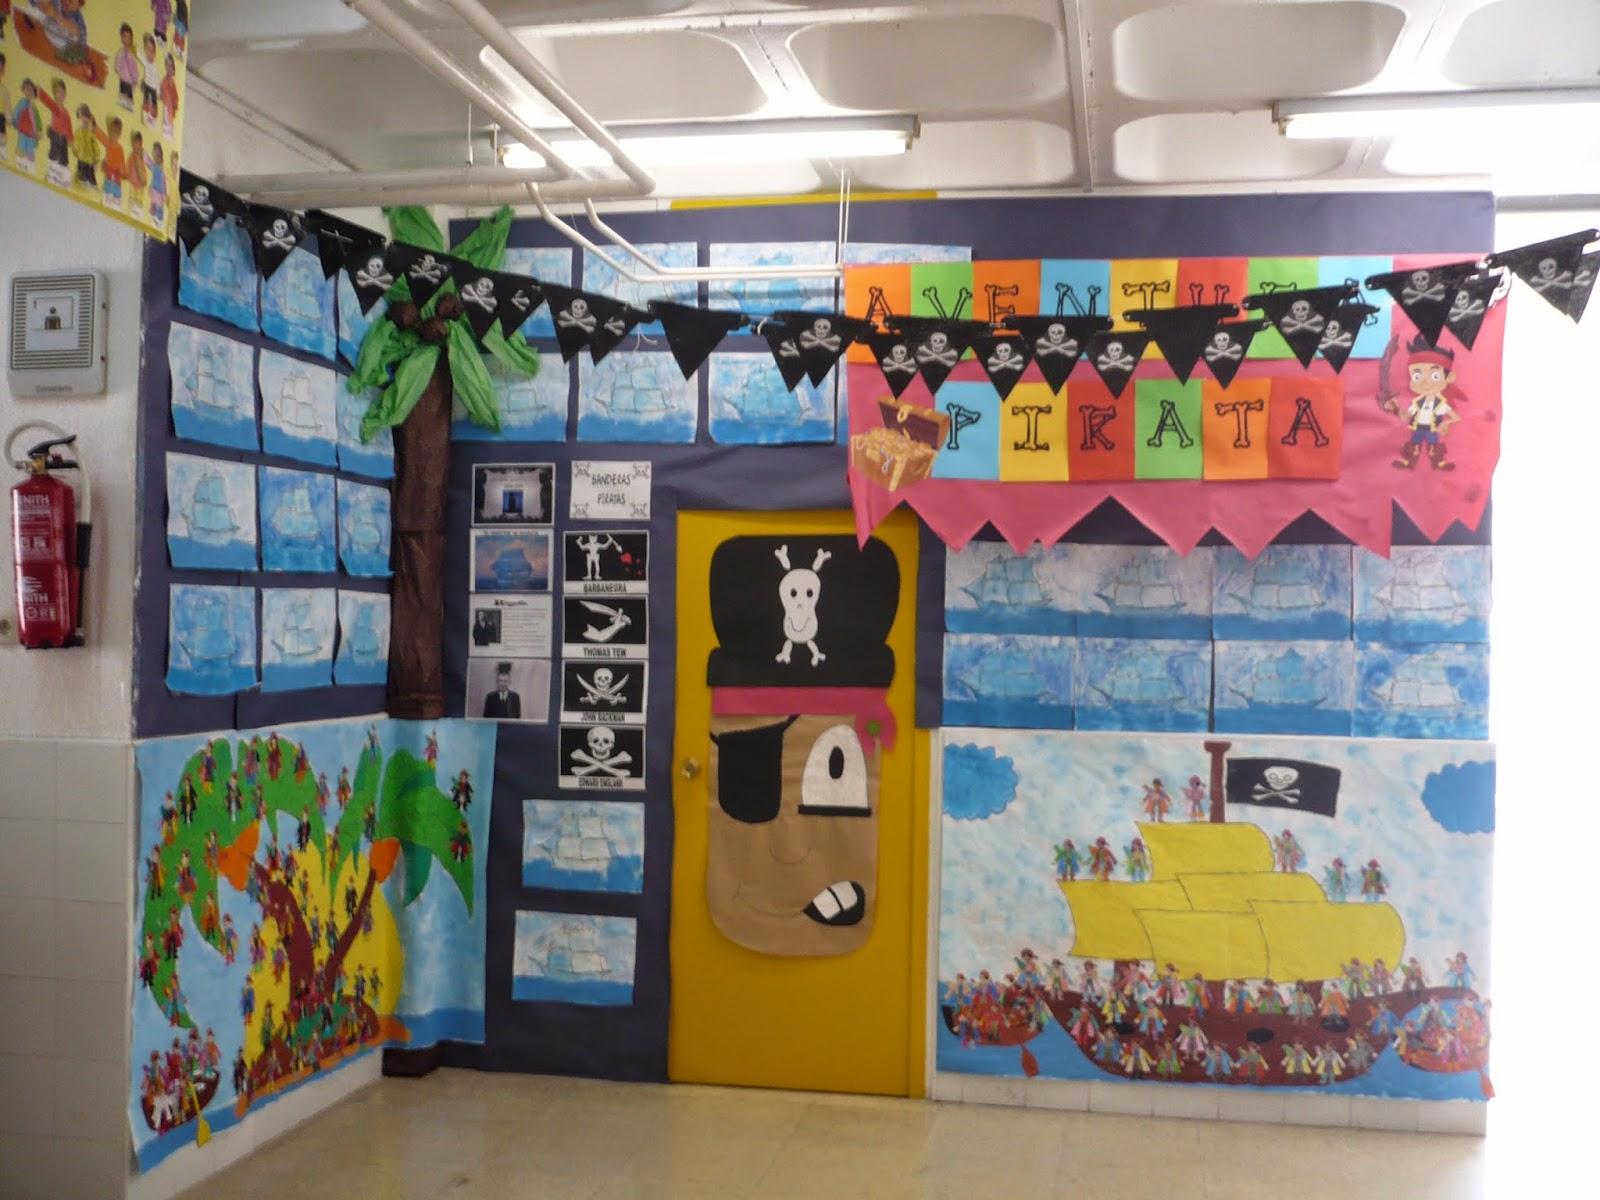 El rinc n de infantil jornadas de animaci n a la lectura for Actividades para jardin infantil